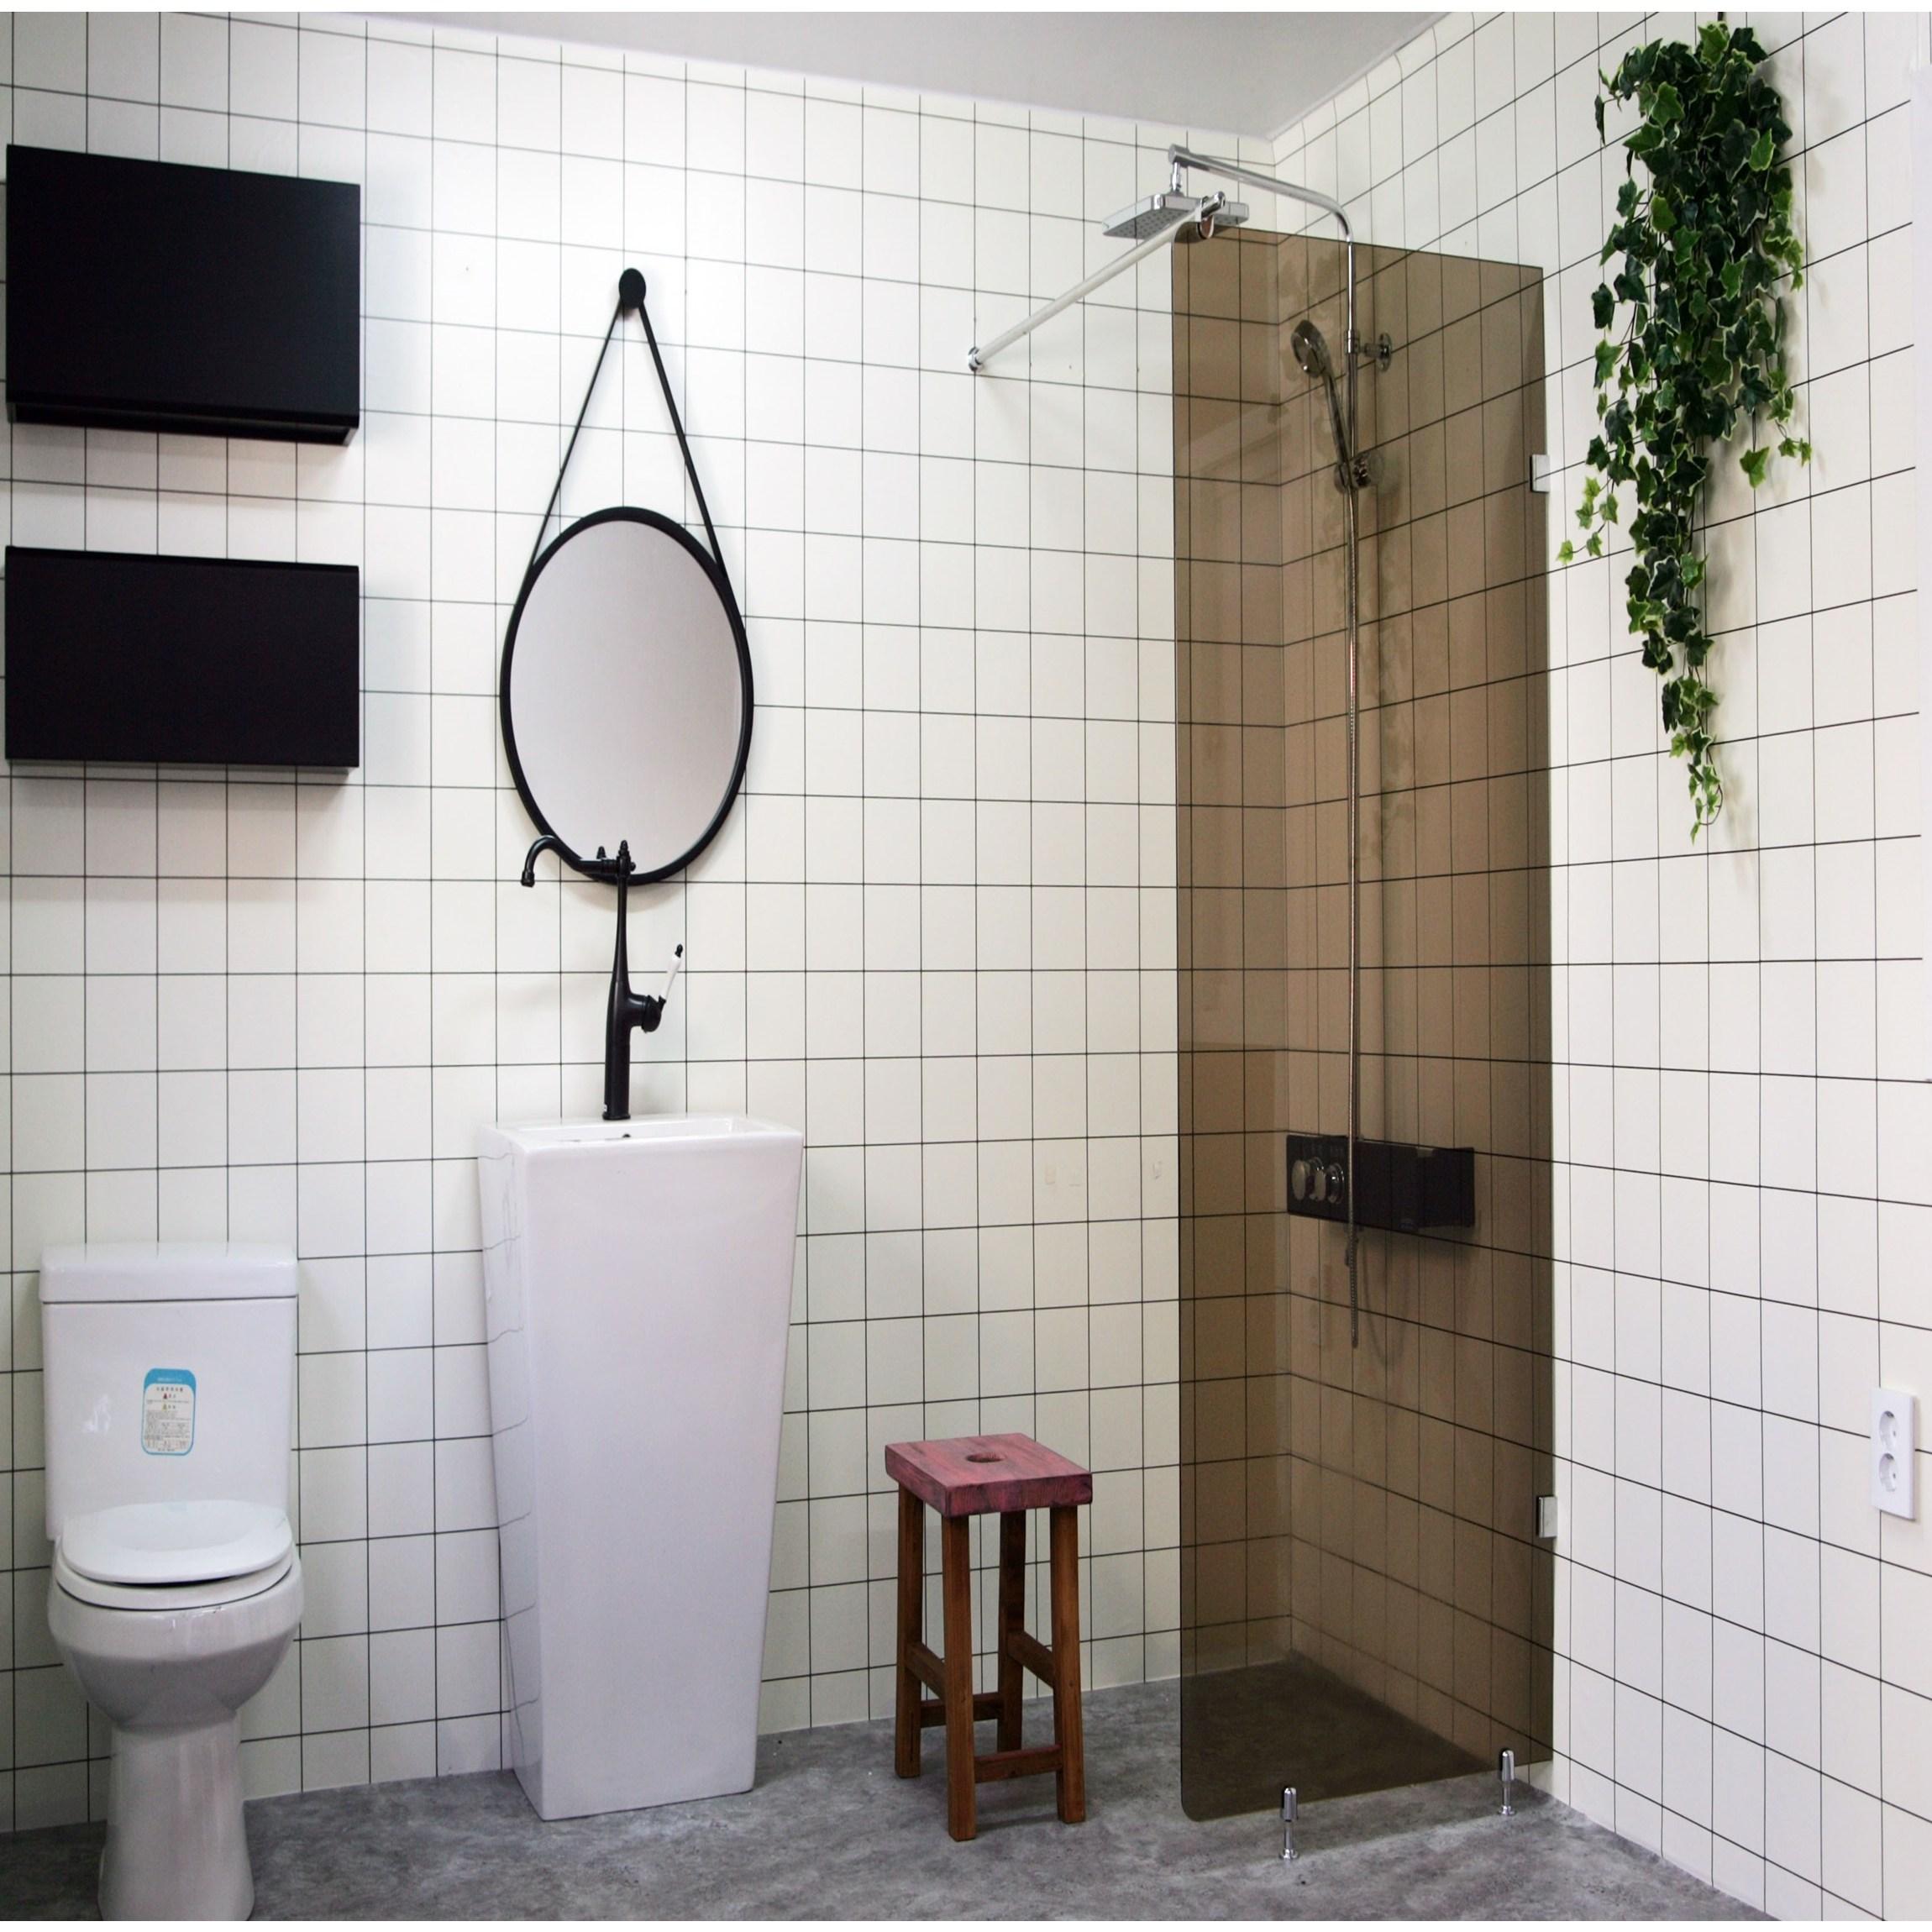 A6마트 브론즈파티션 욕실파티션 갈색파티션 욕실인테리어 물막이, 450